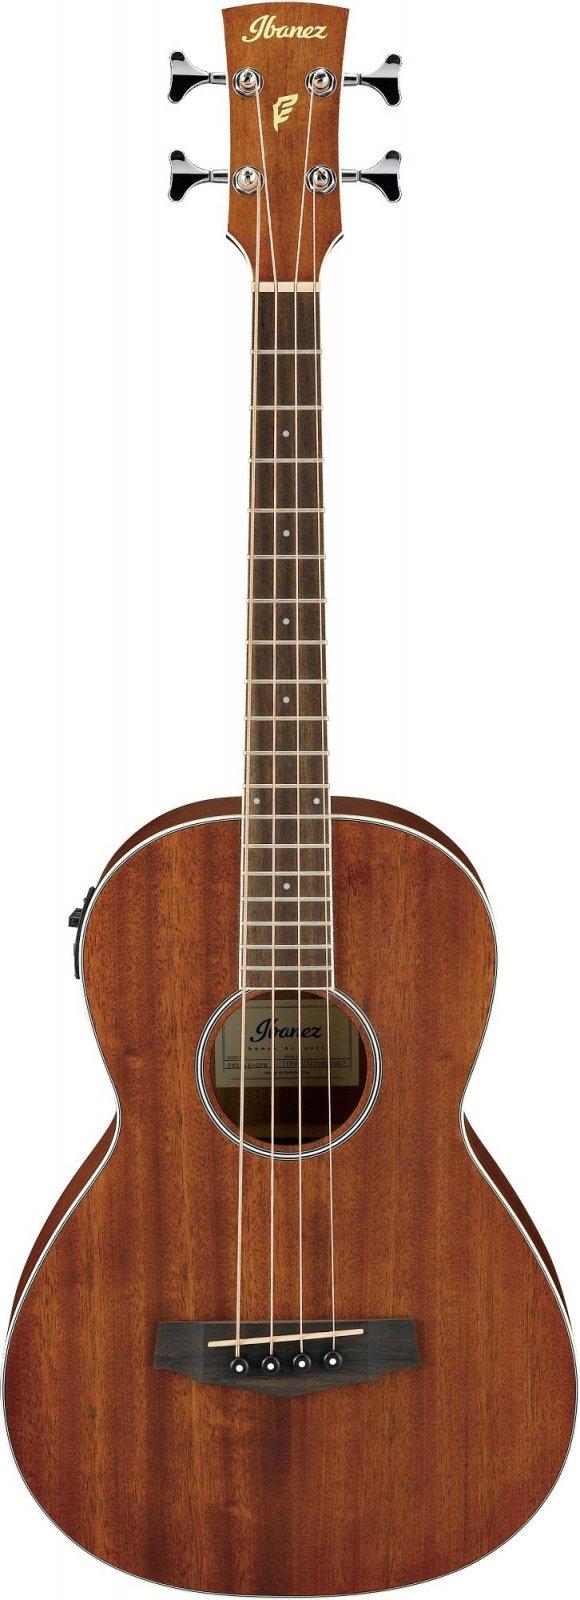 Ibanez PNB14EOPN Parlor Acoustic-Electric Bass - Open Pore Natural